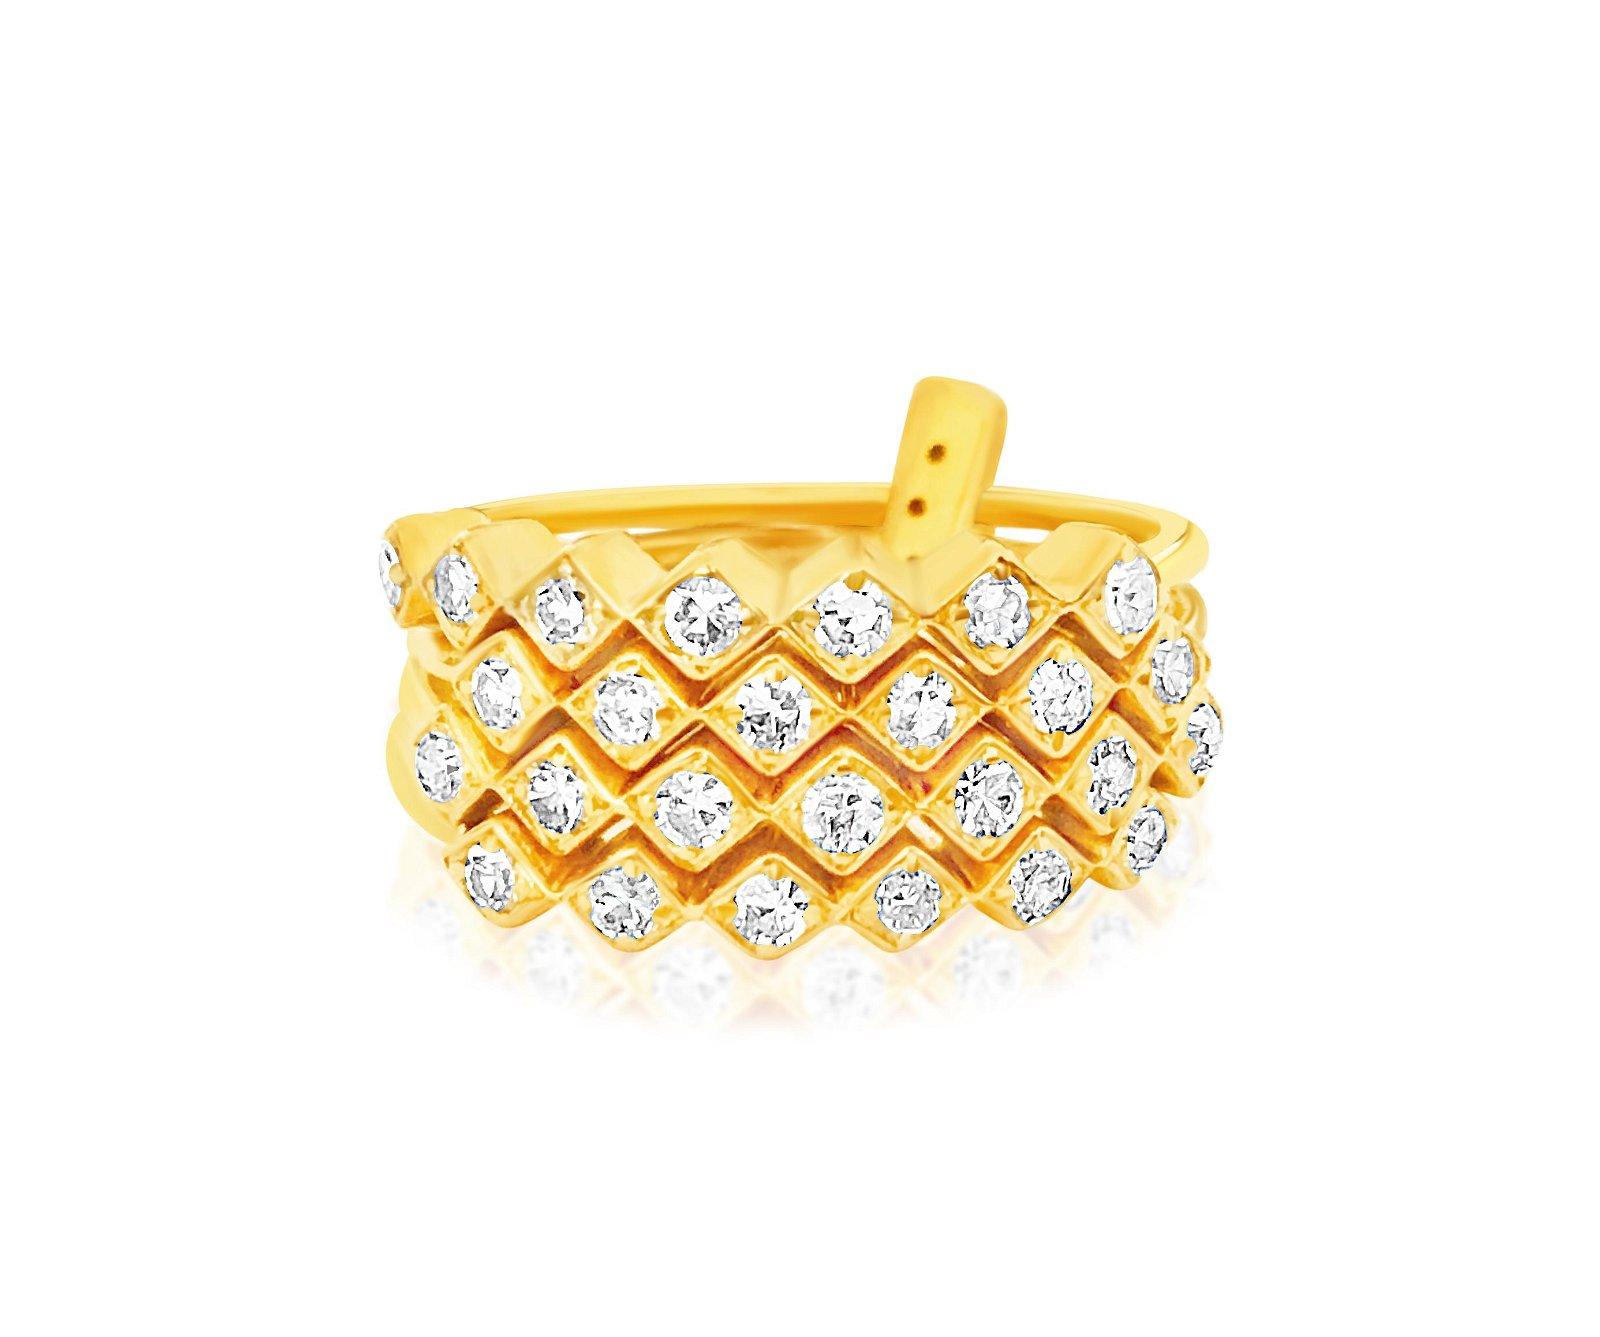 Vintage Womens 1.00ct Diamond & 14K Gold Stack Rings